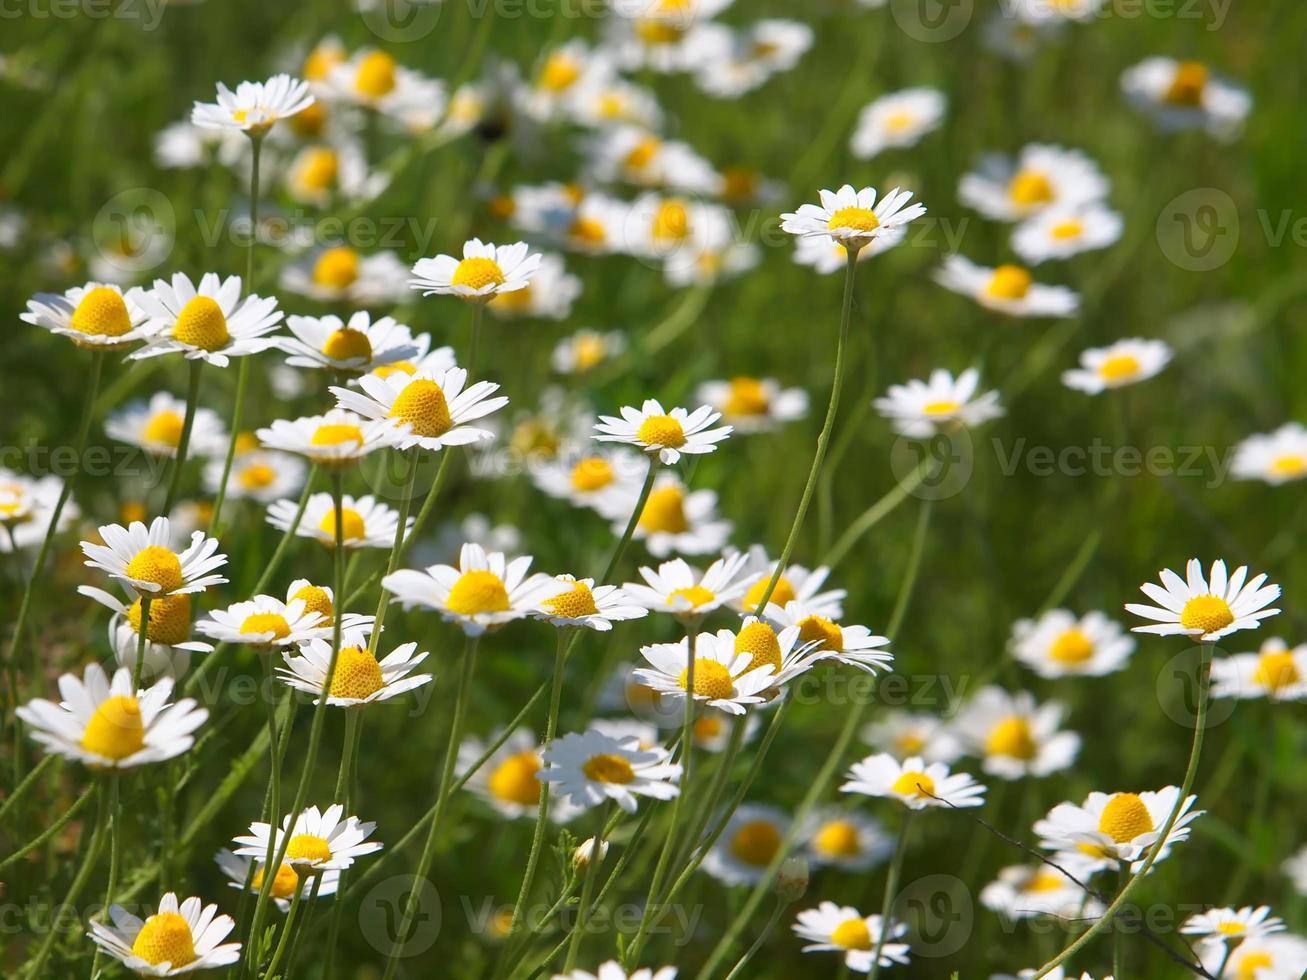 pianta e fiori di anthemis arvensis foto